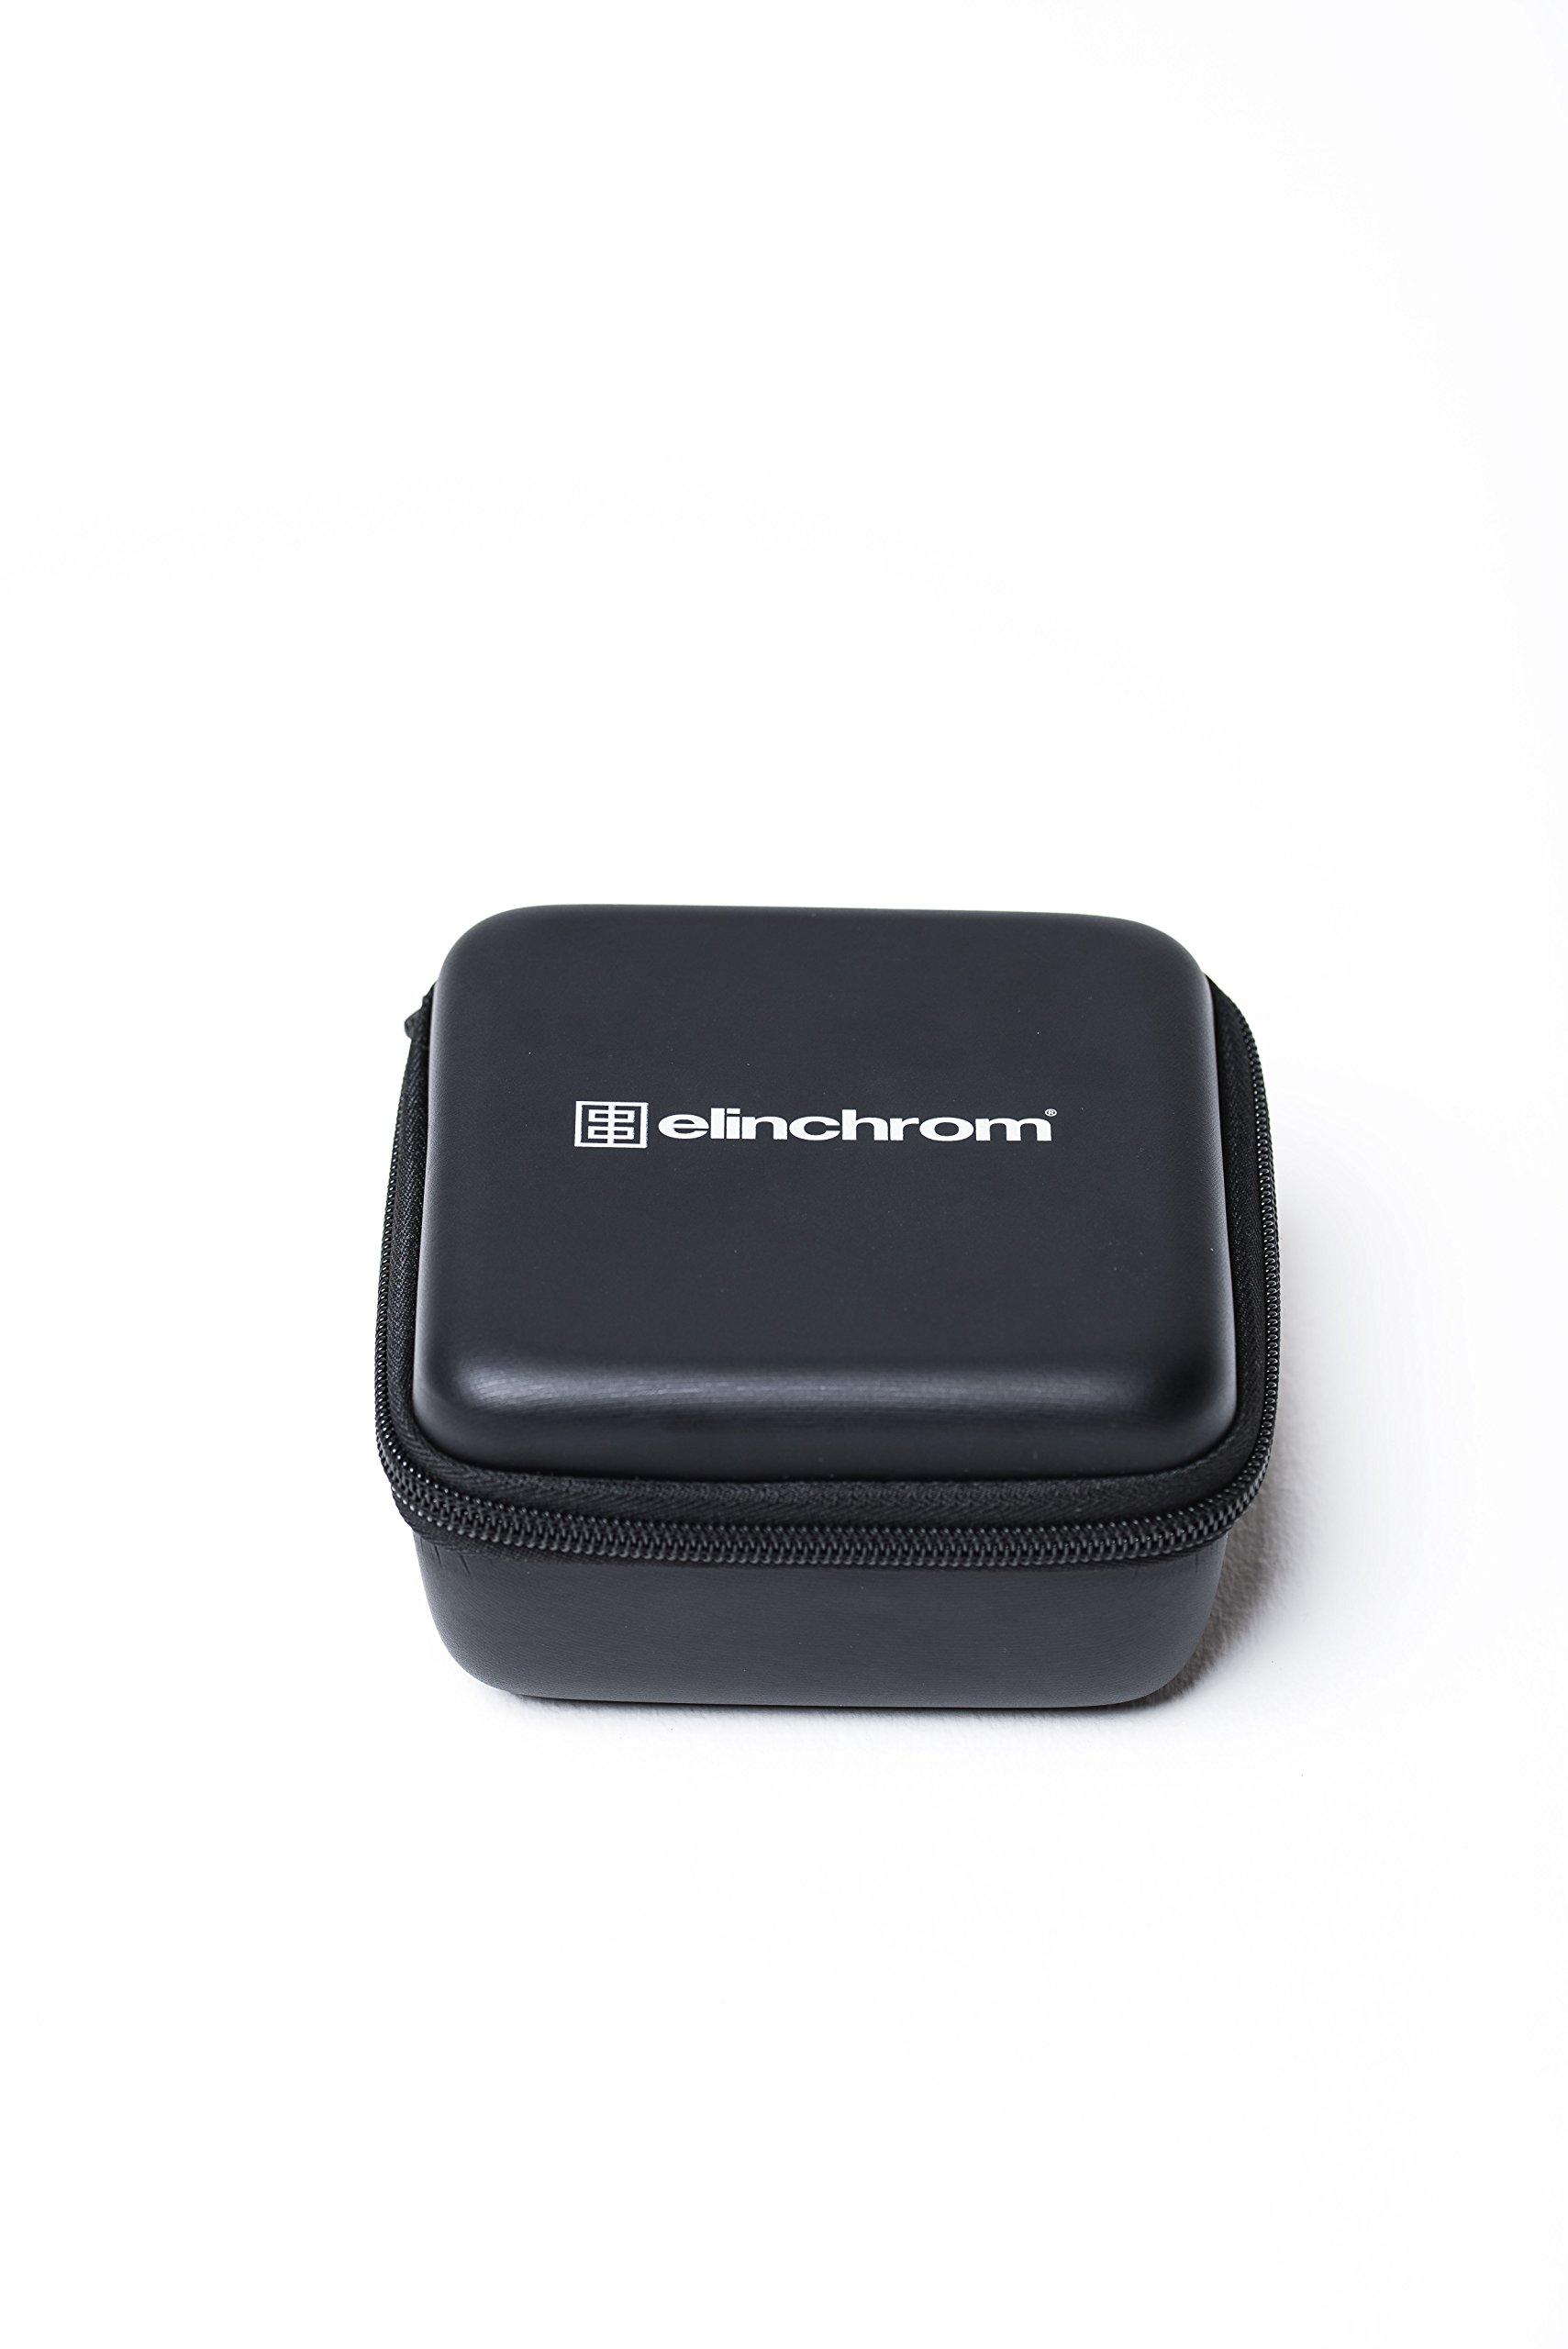 Elinchrom Skyport Box Transporter Professional Video Equipment Case - Gray (EL33238)